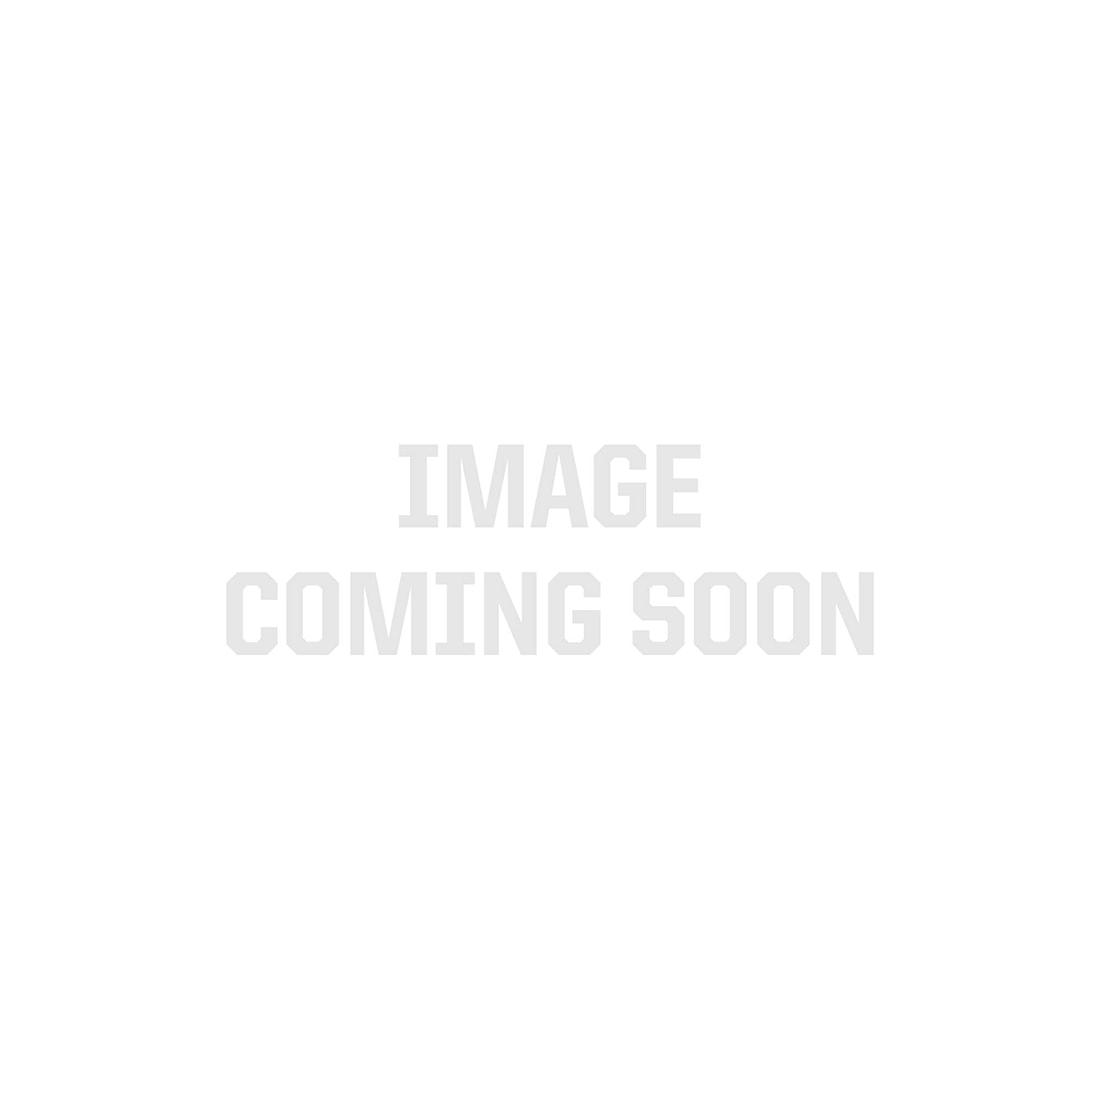 Kichler Design Pro LED Dimming Switch (Black) (Optional)